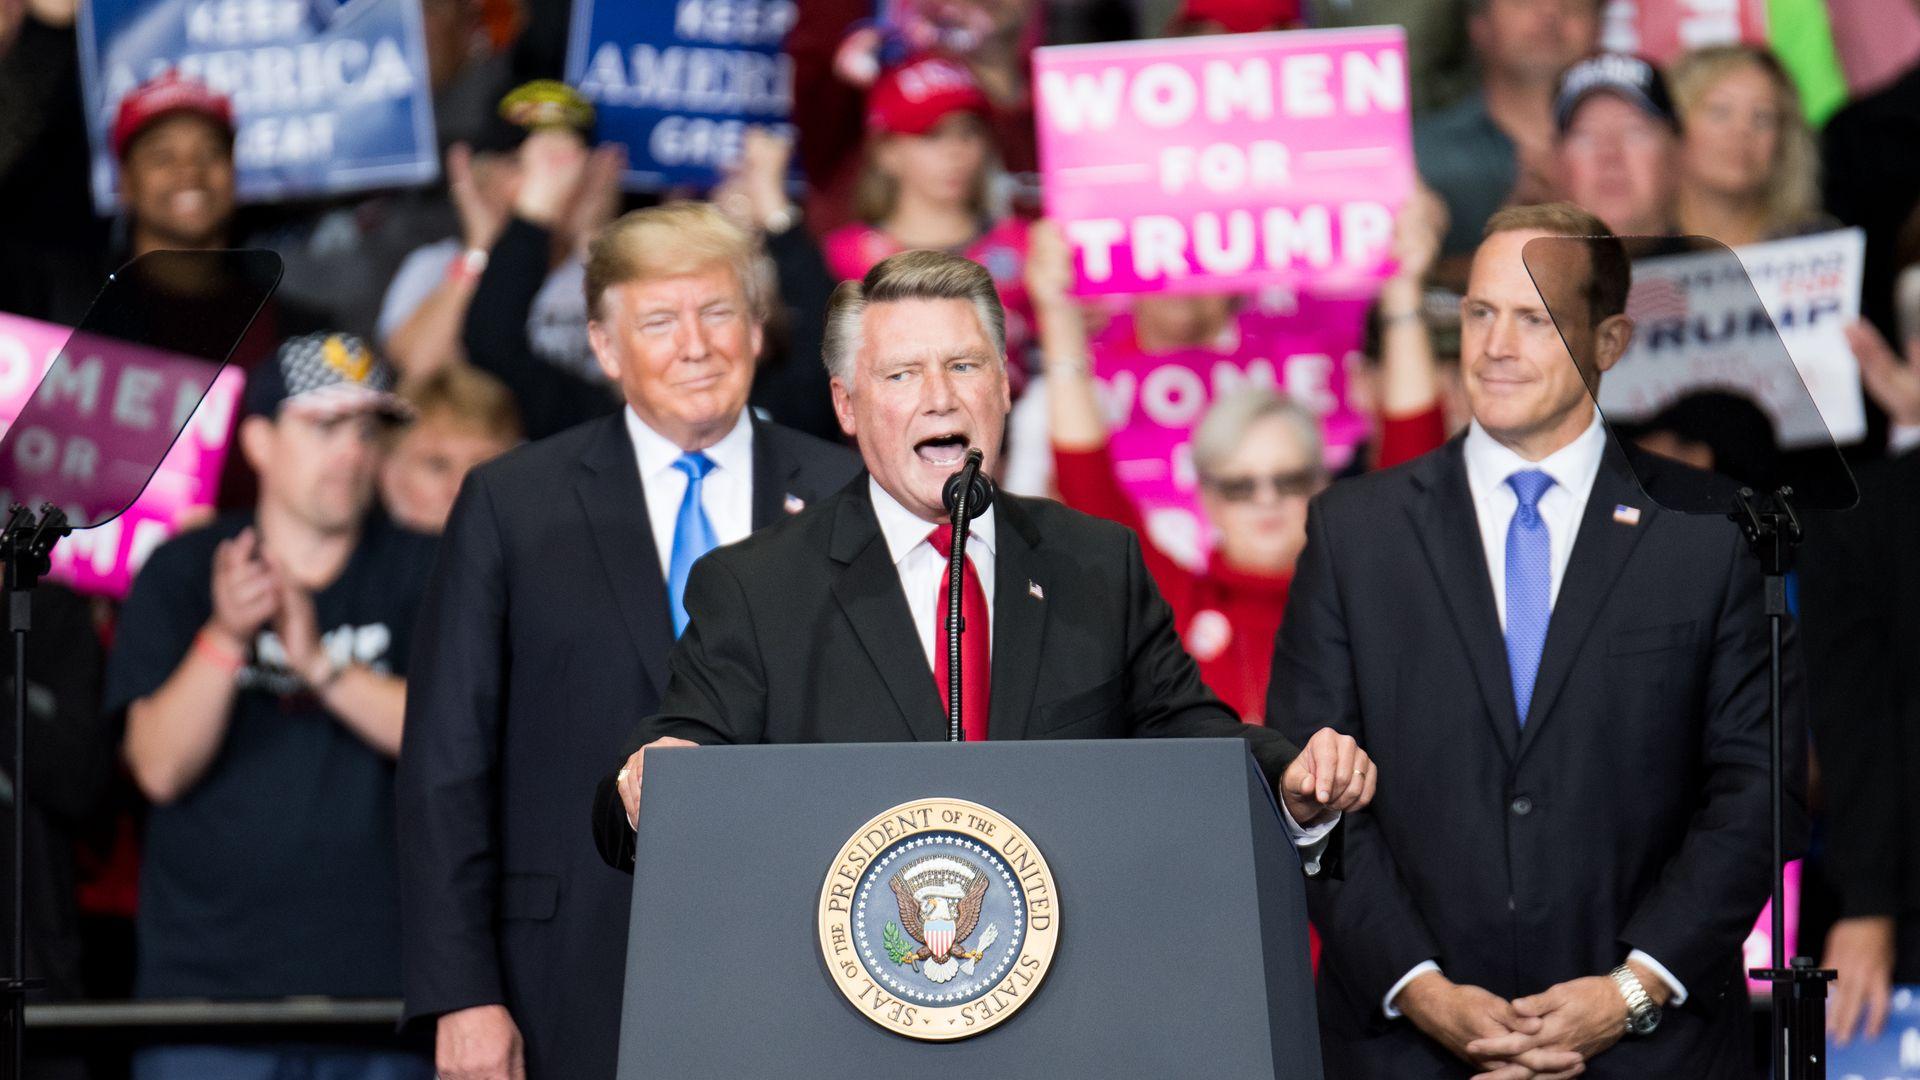 North Carolina GOP candidate Mark Harris denies knowledge of electoral fraud